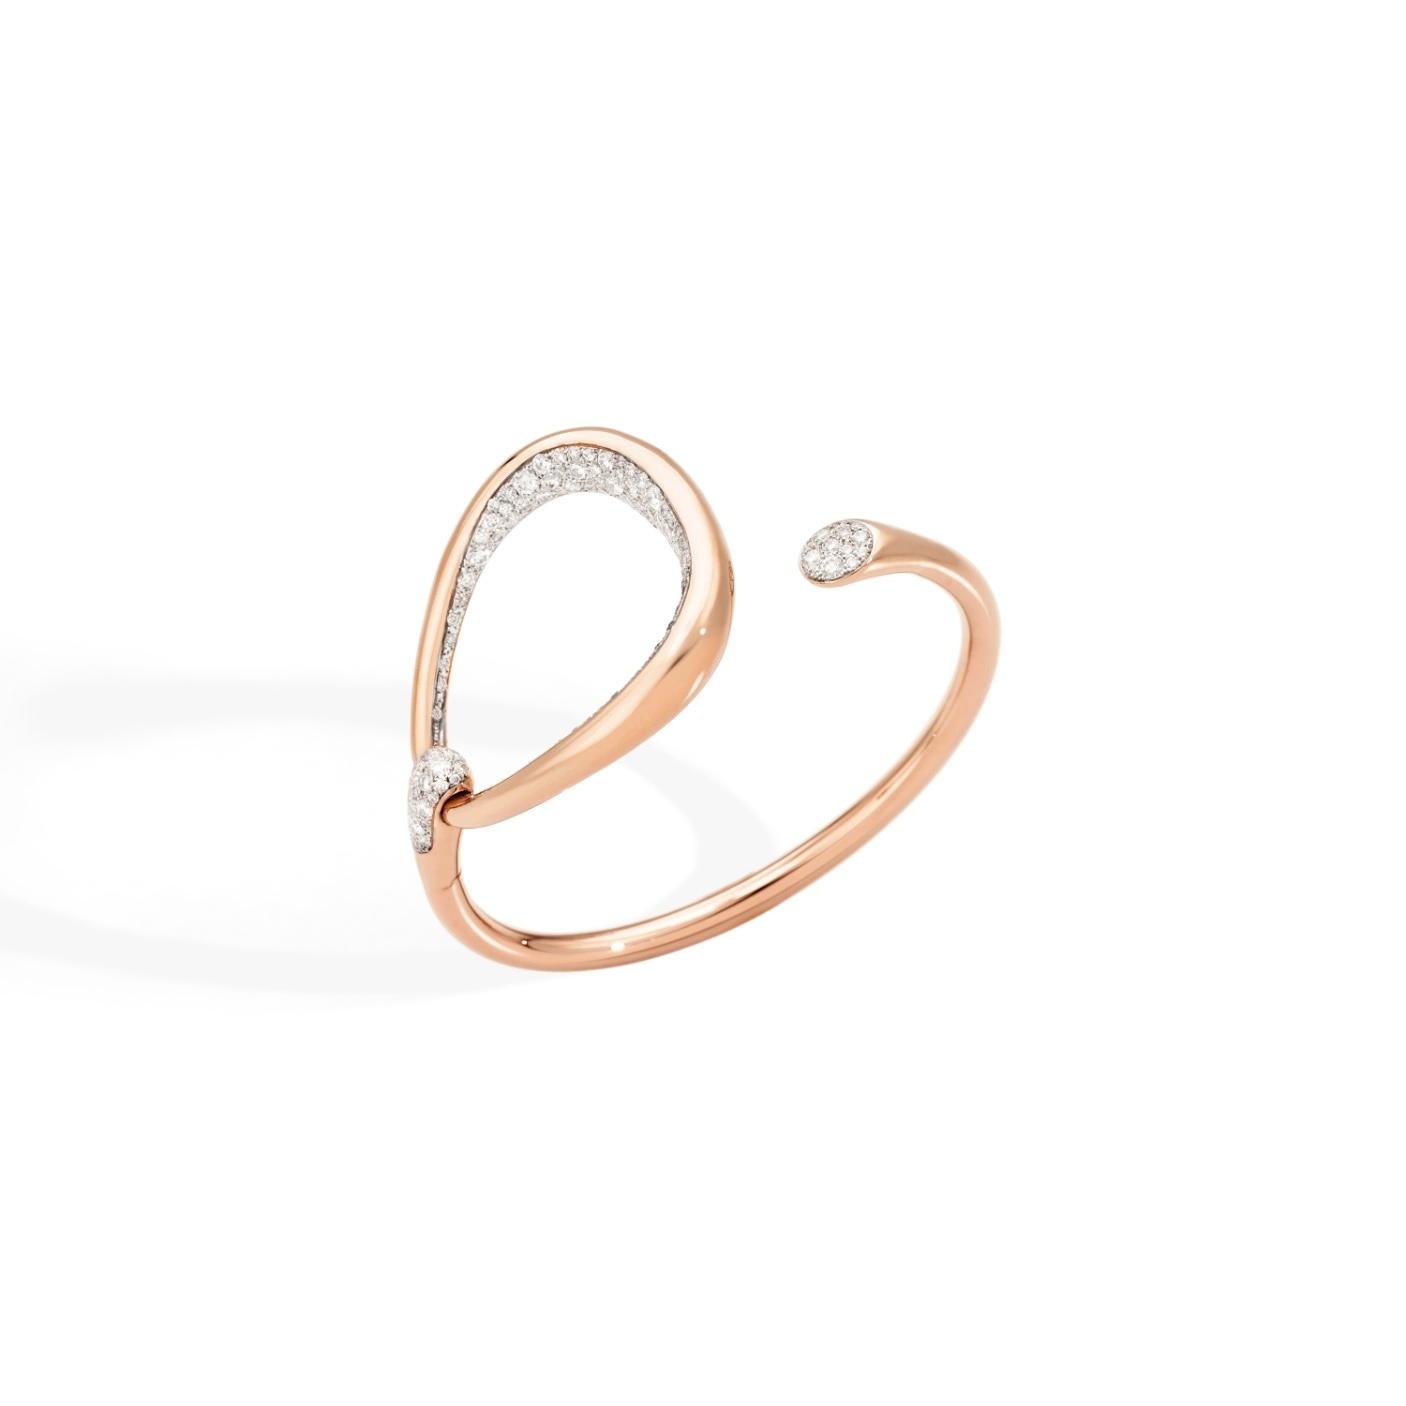 Pomellato Pomellato Fantina armband in 18 krt. roségoud met witte diamanten